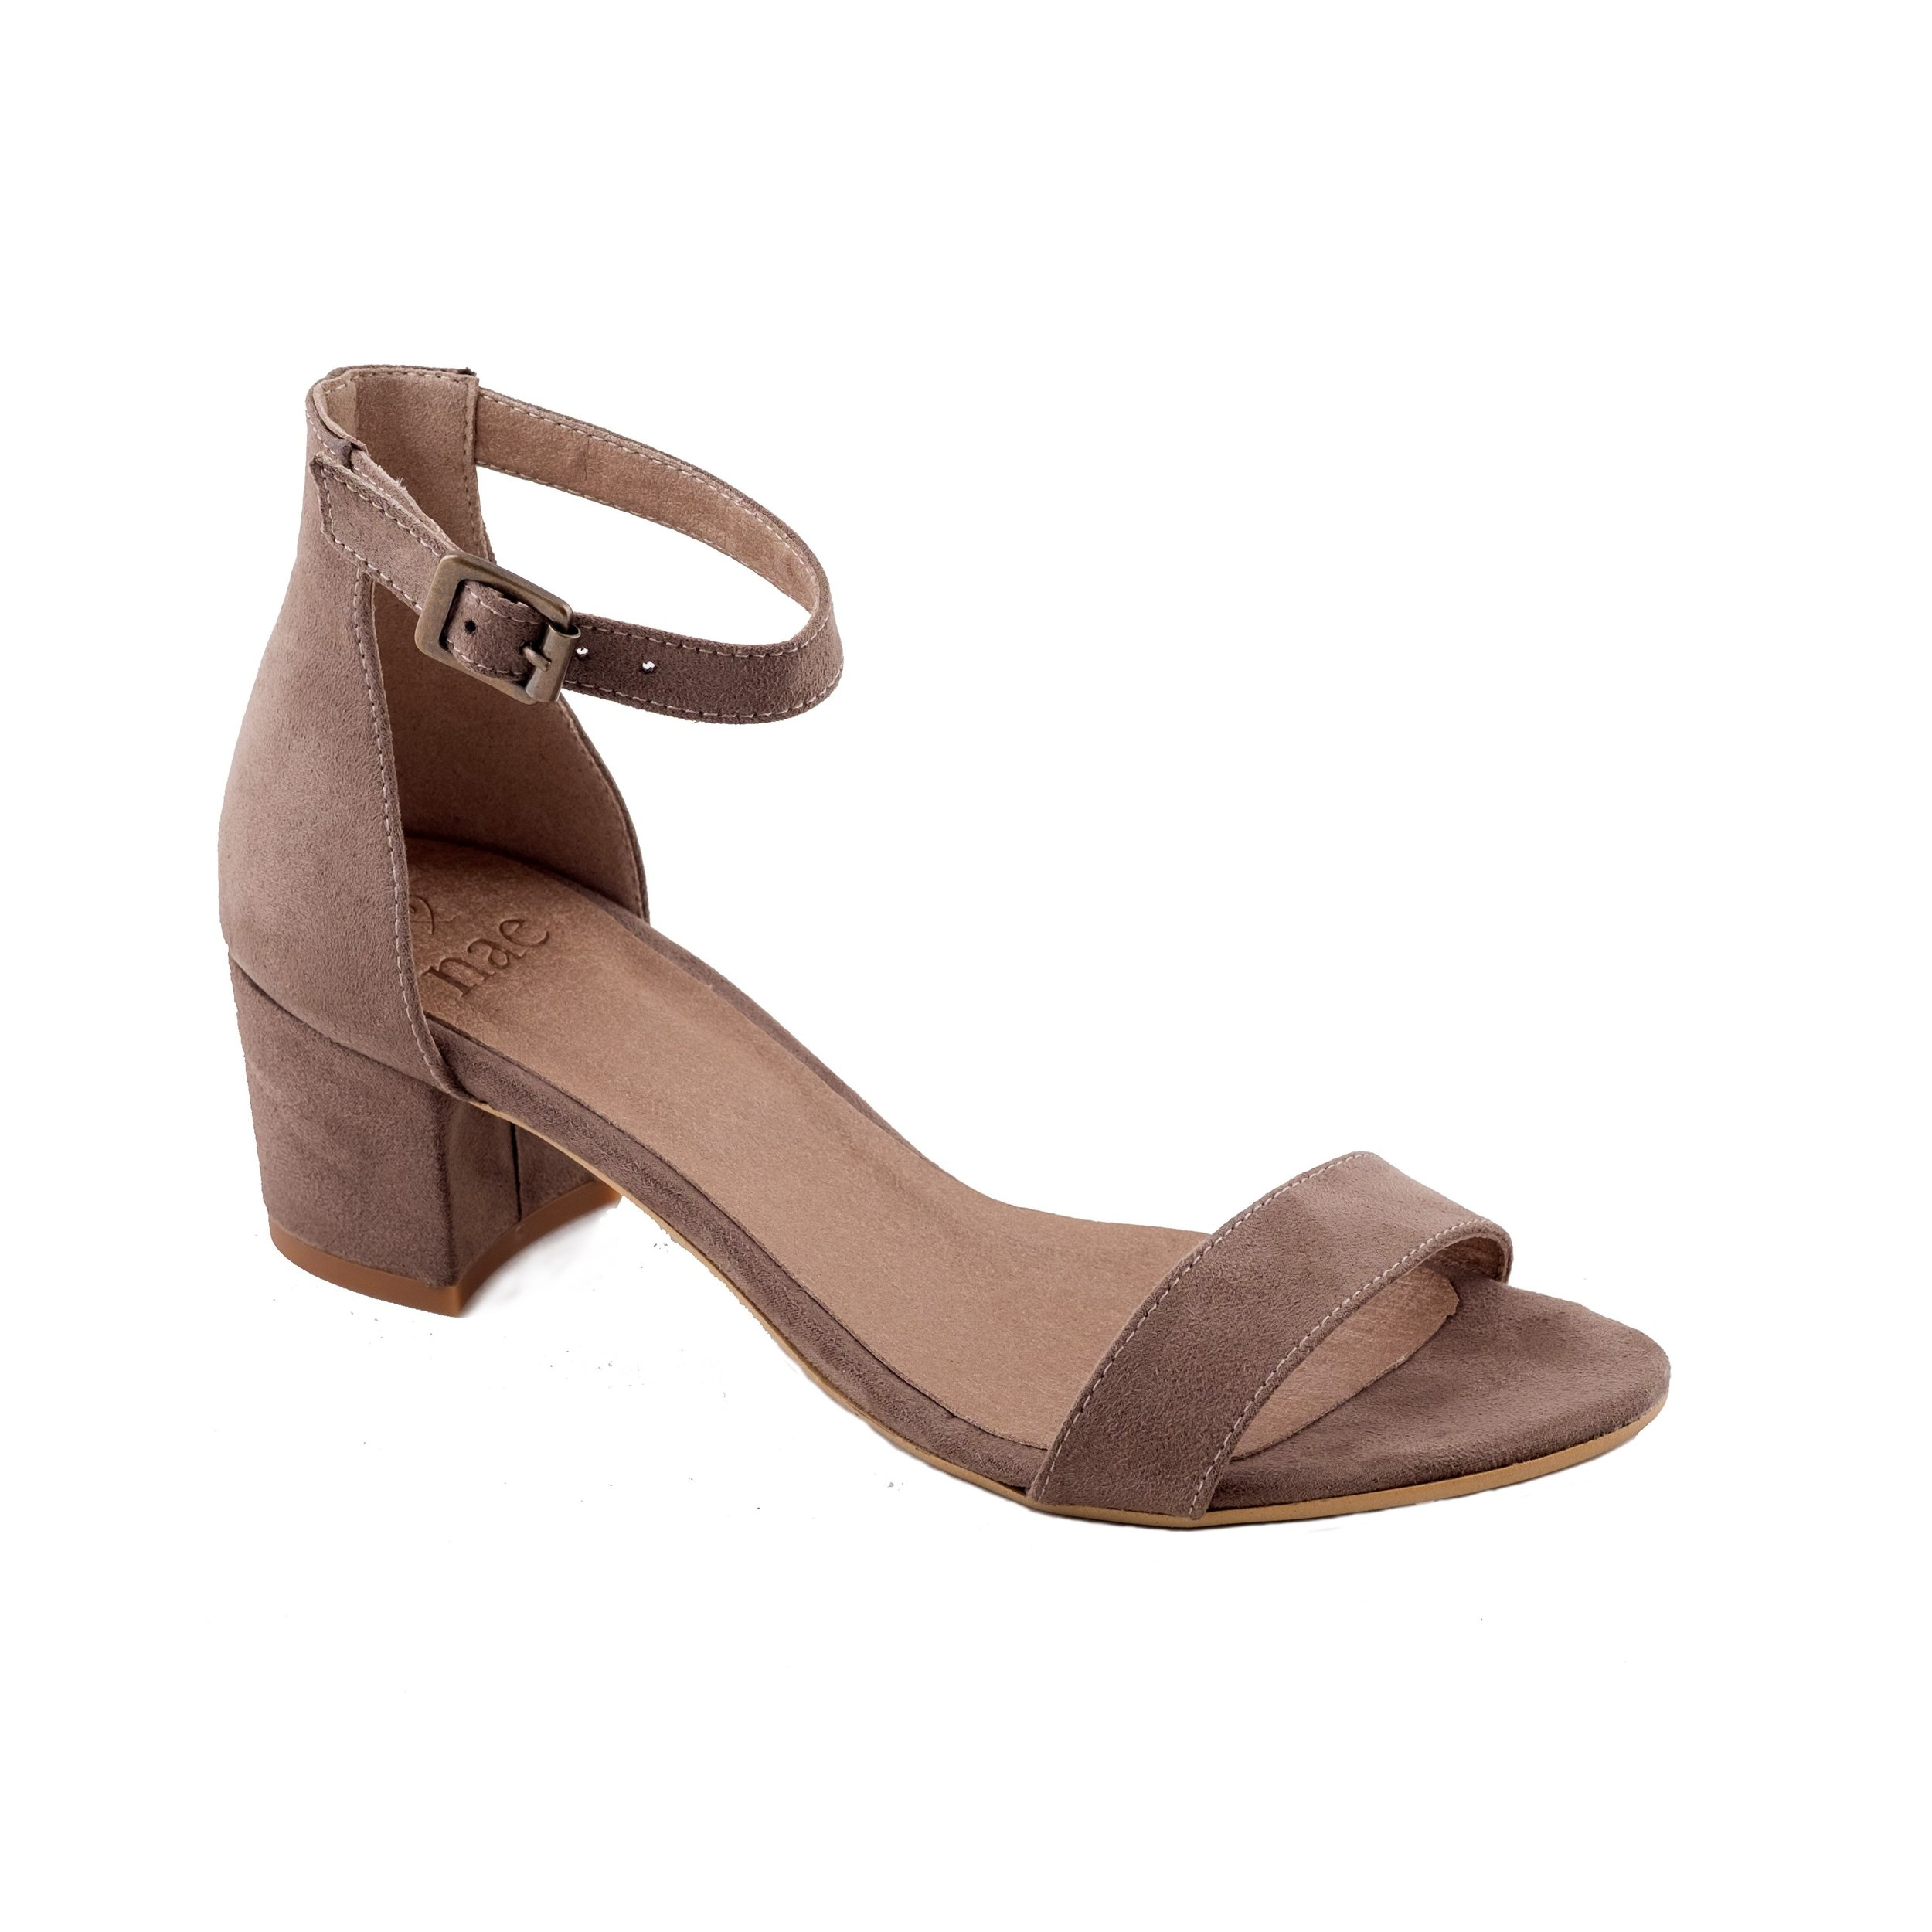 NAE Irene: Vegan Suede Sandals - Shop at Shop.addresschic.com